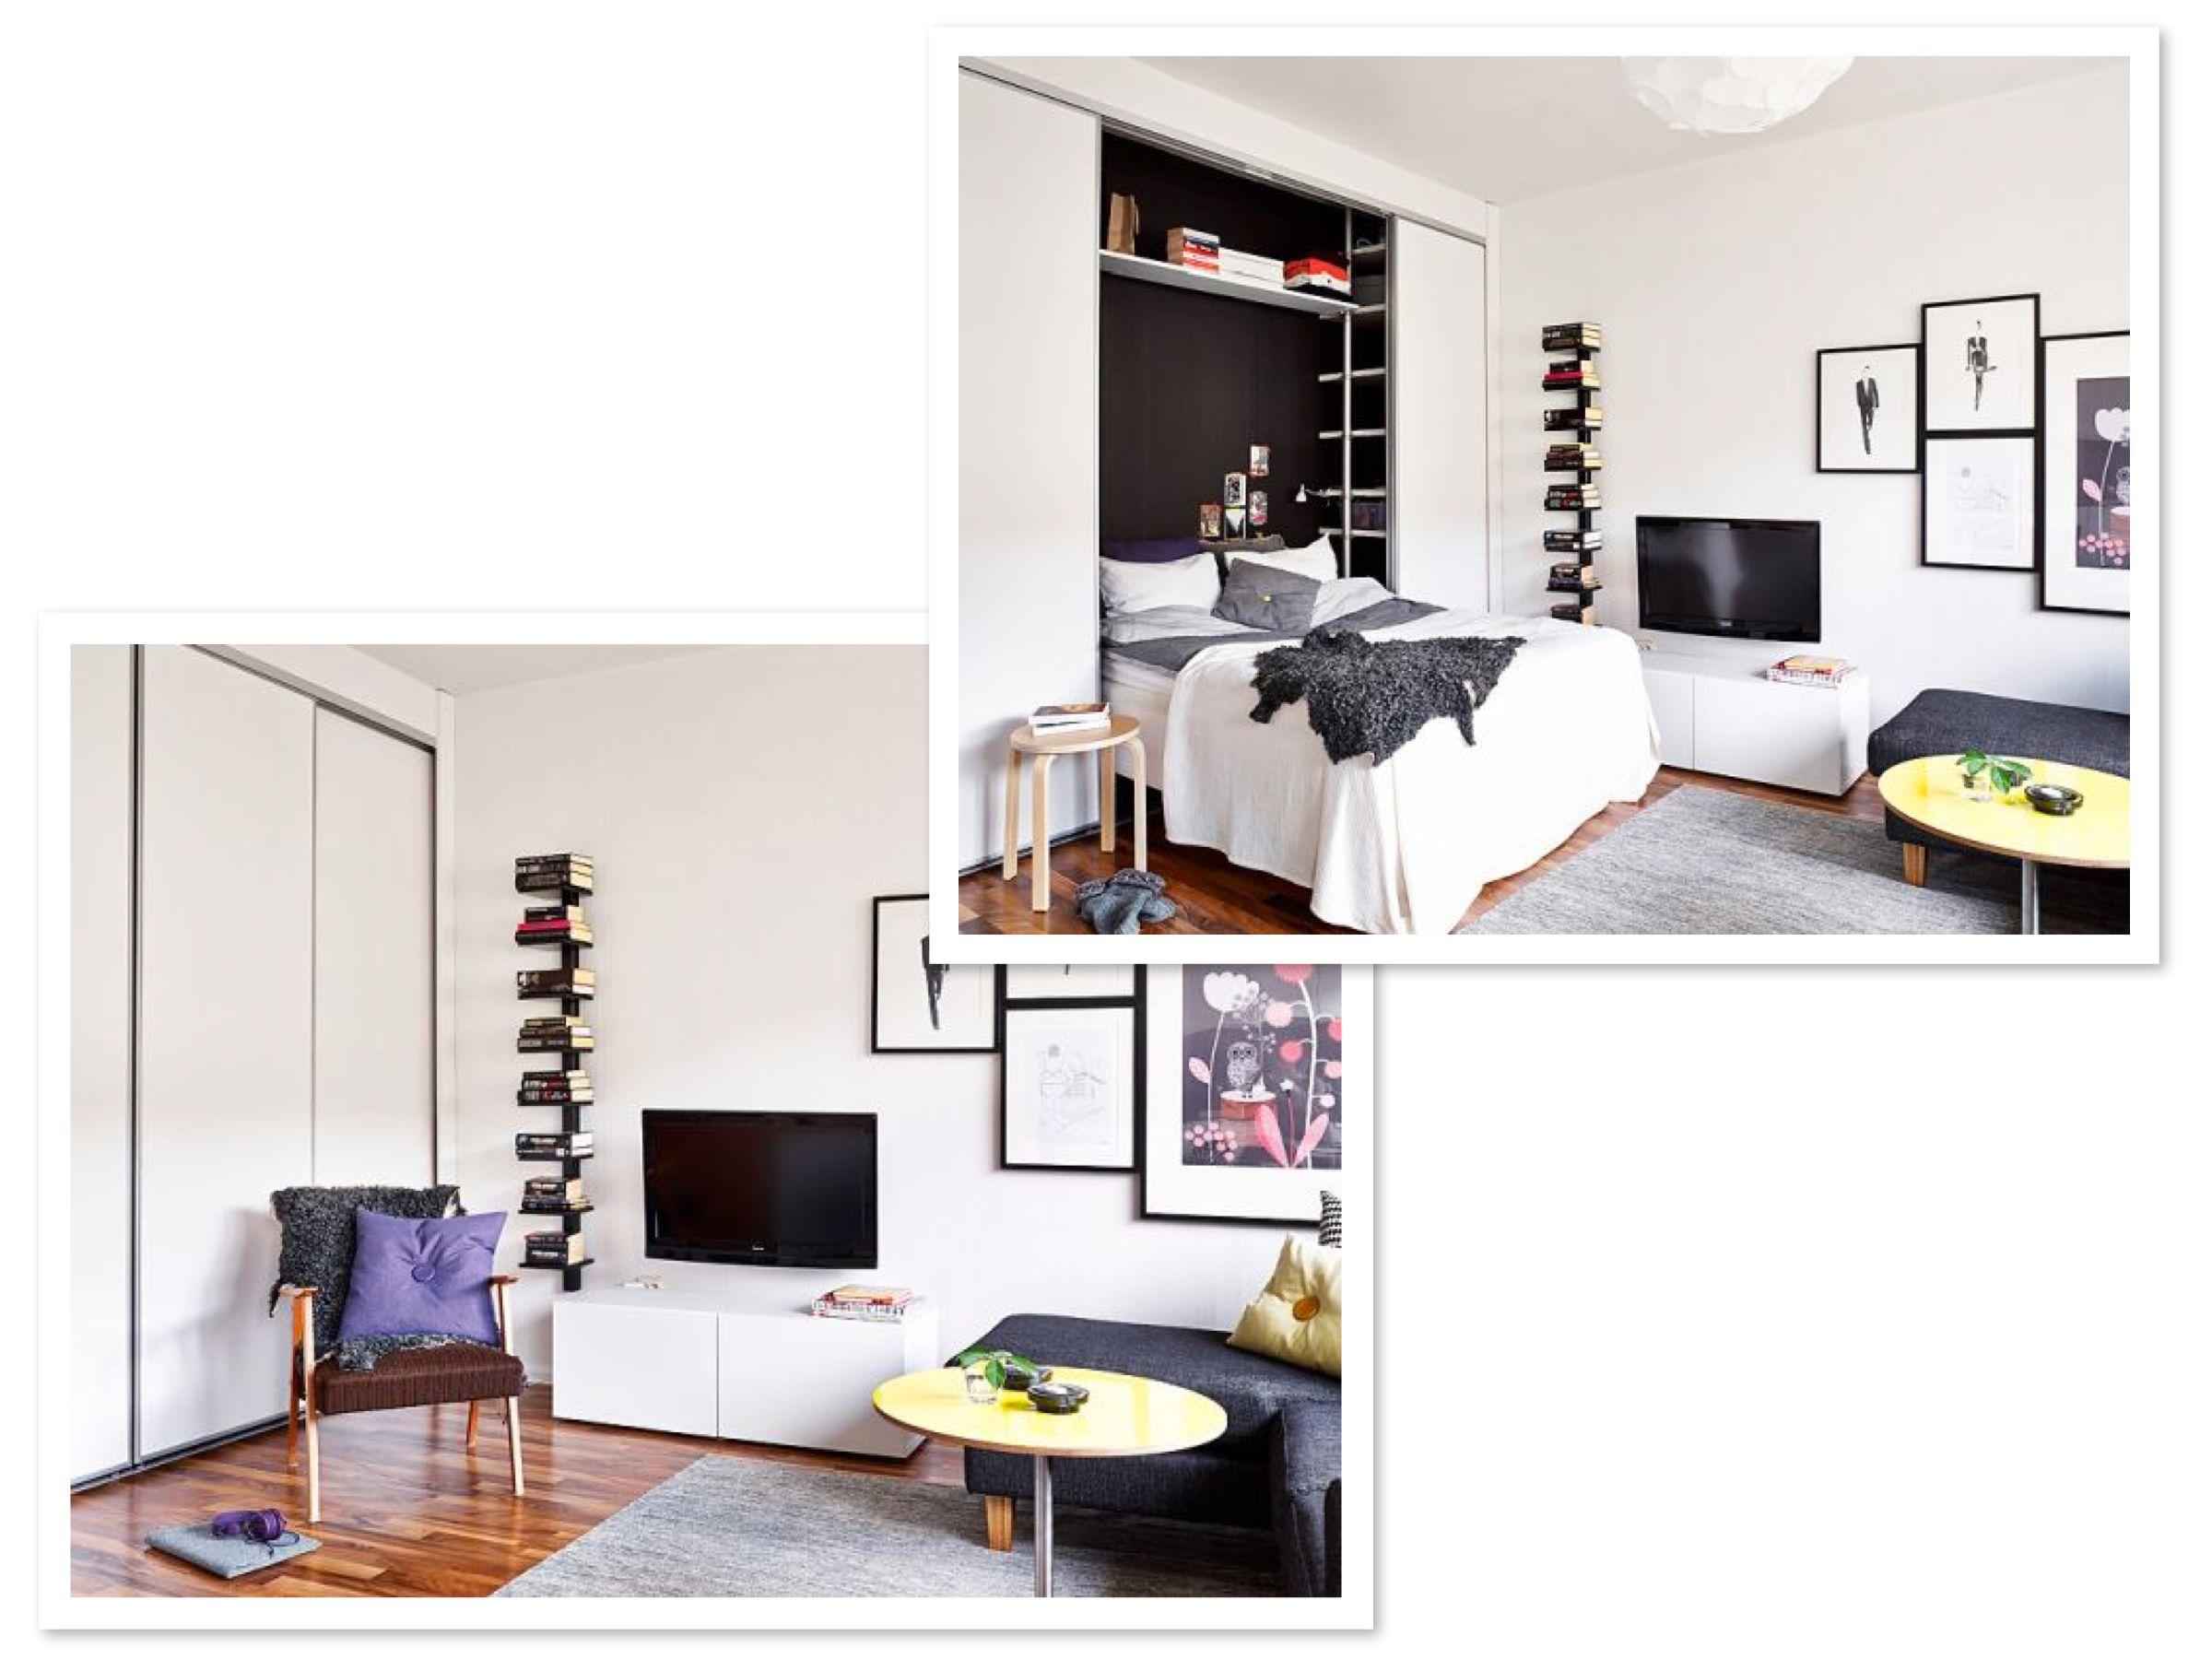 Dropdown bed closet with sliding door! Interior design